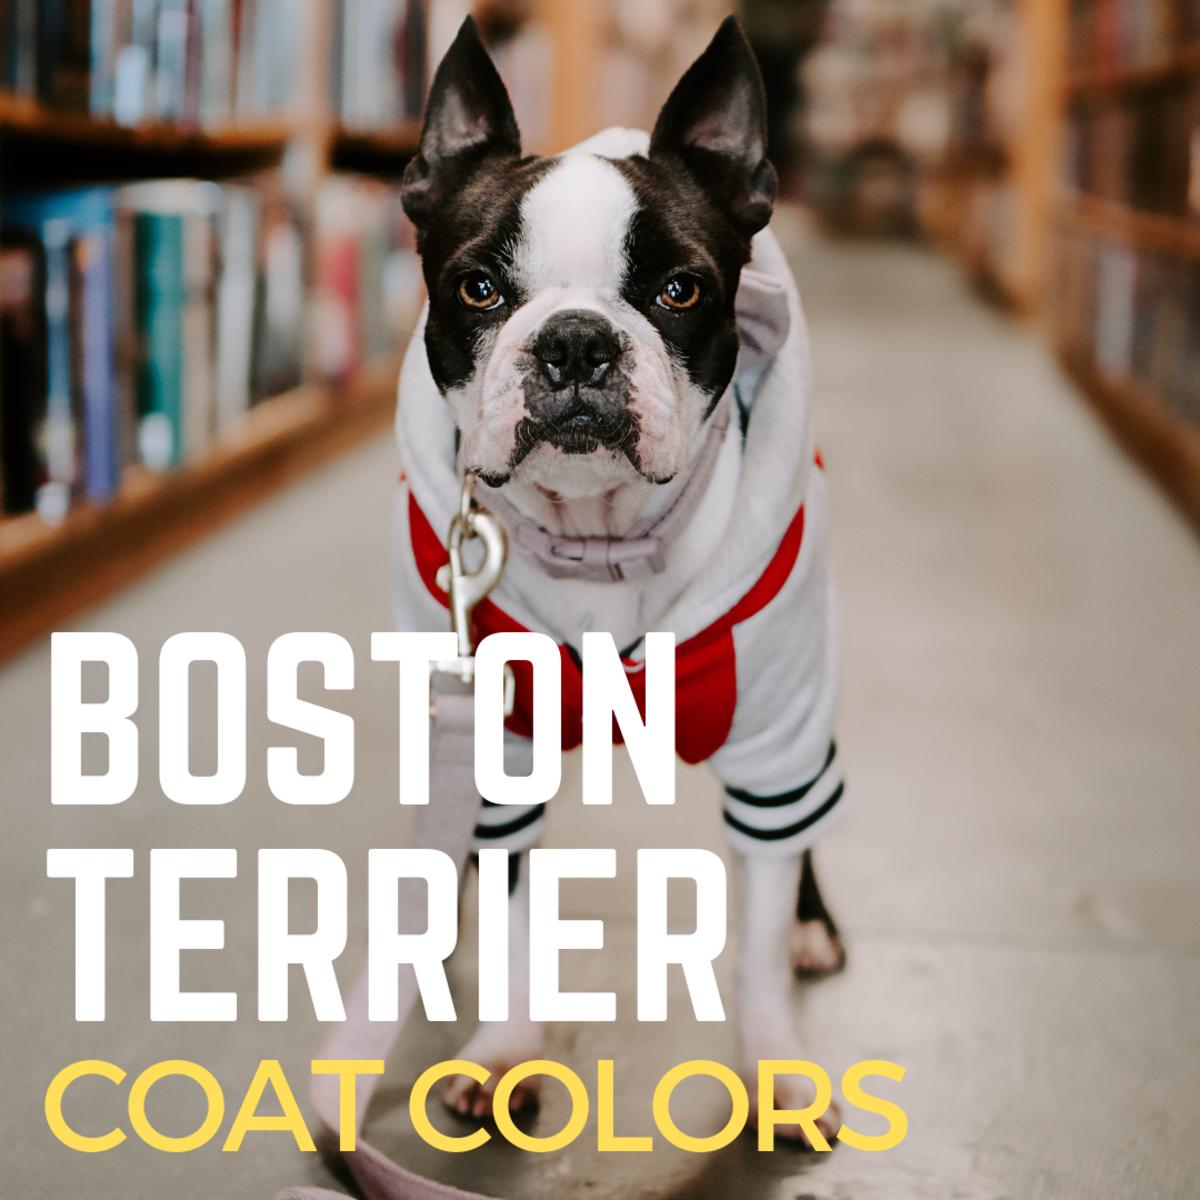 Boston Terrier Coat Colors